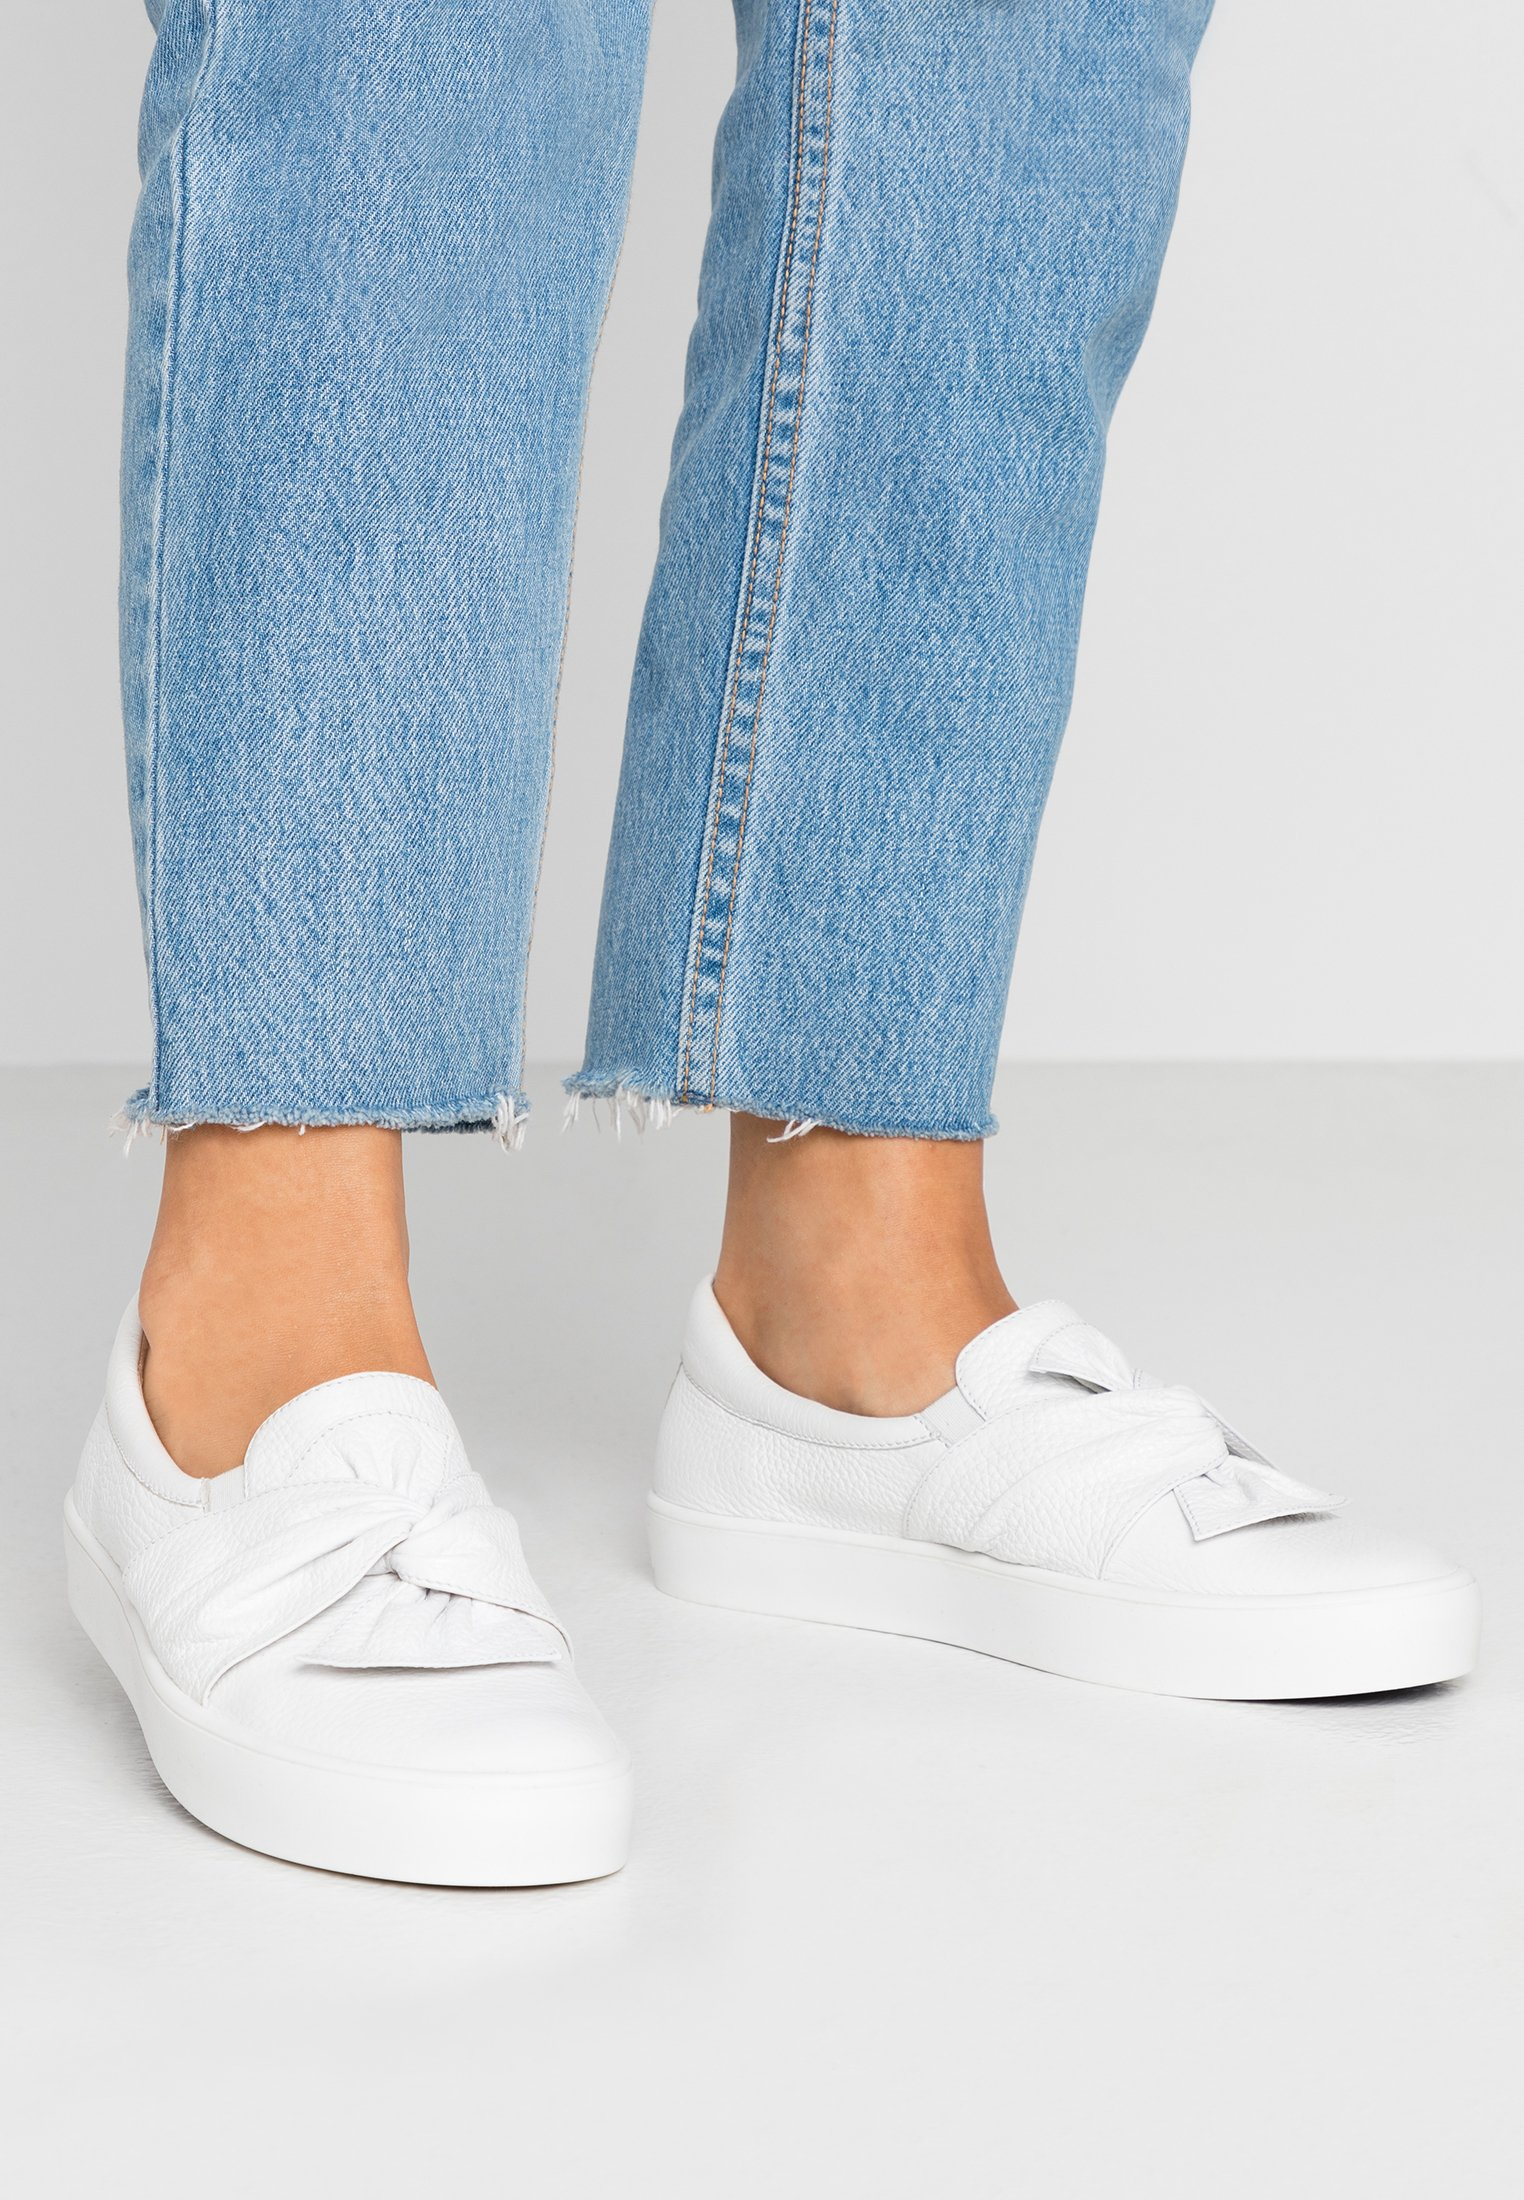 Caprice Mocassins - white